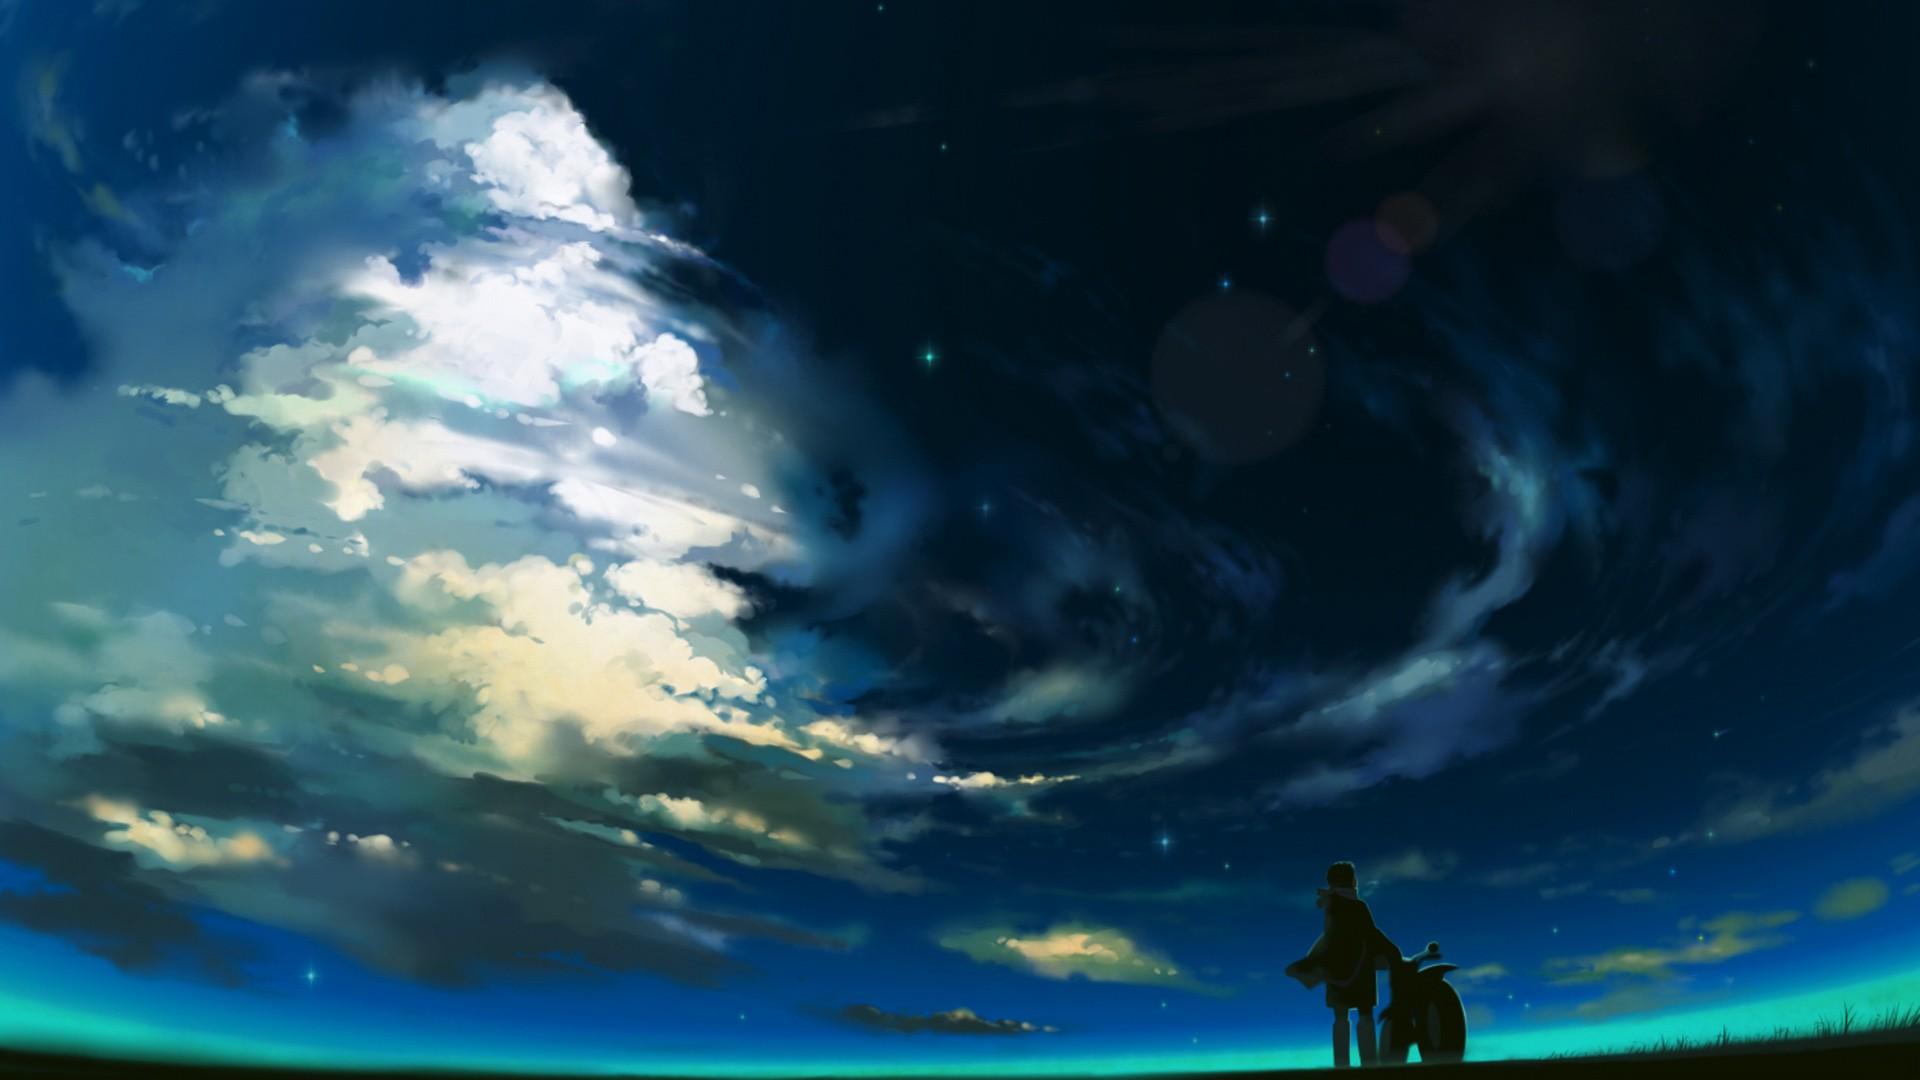 Anime Desktop Background - Anime ...